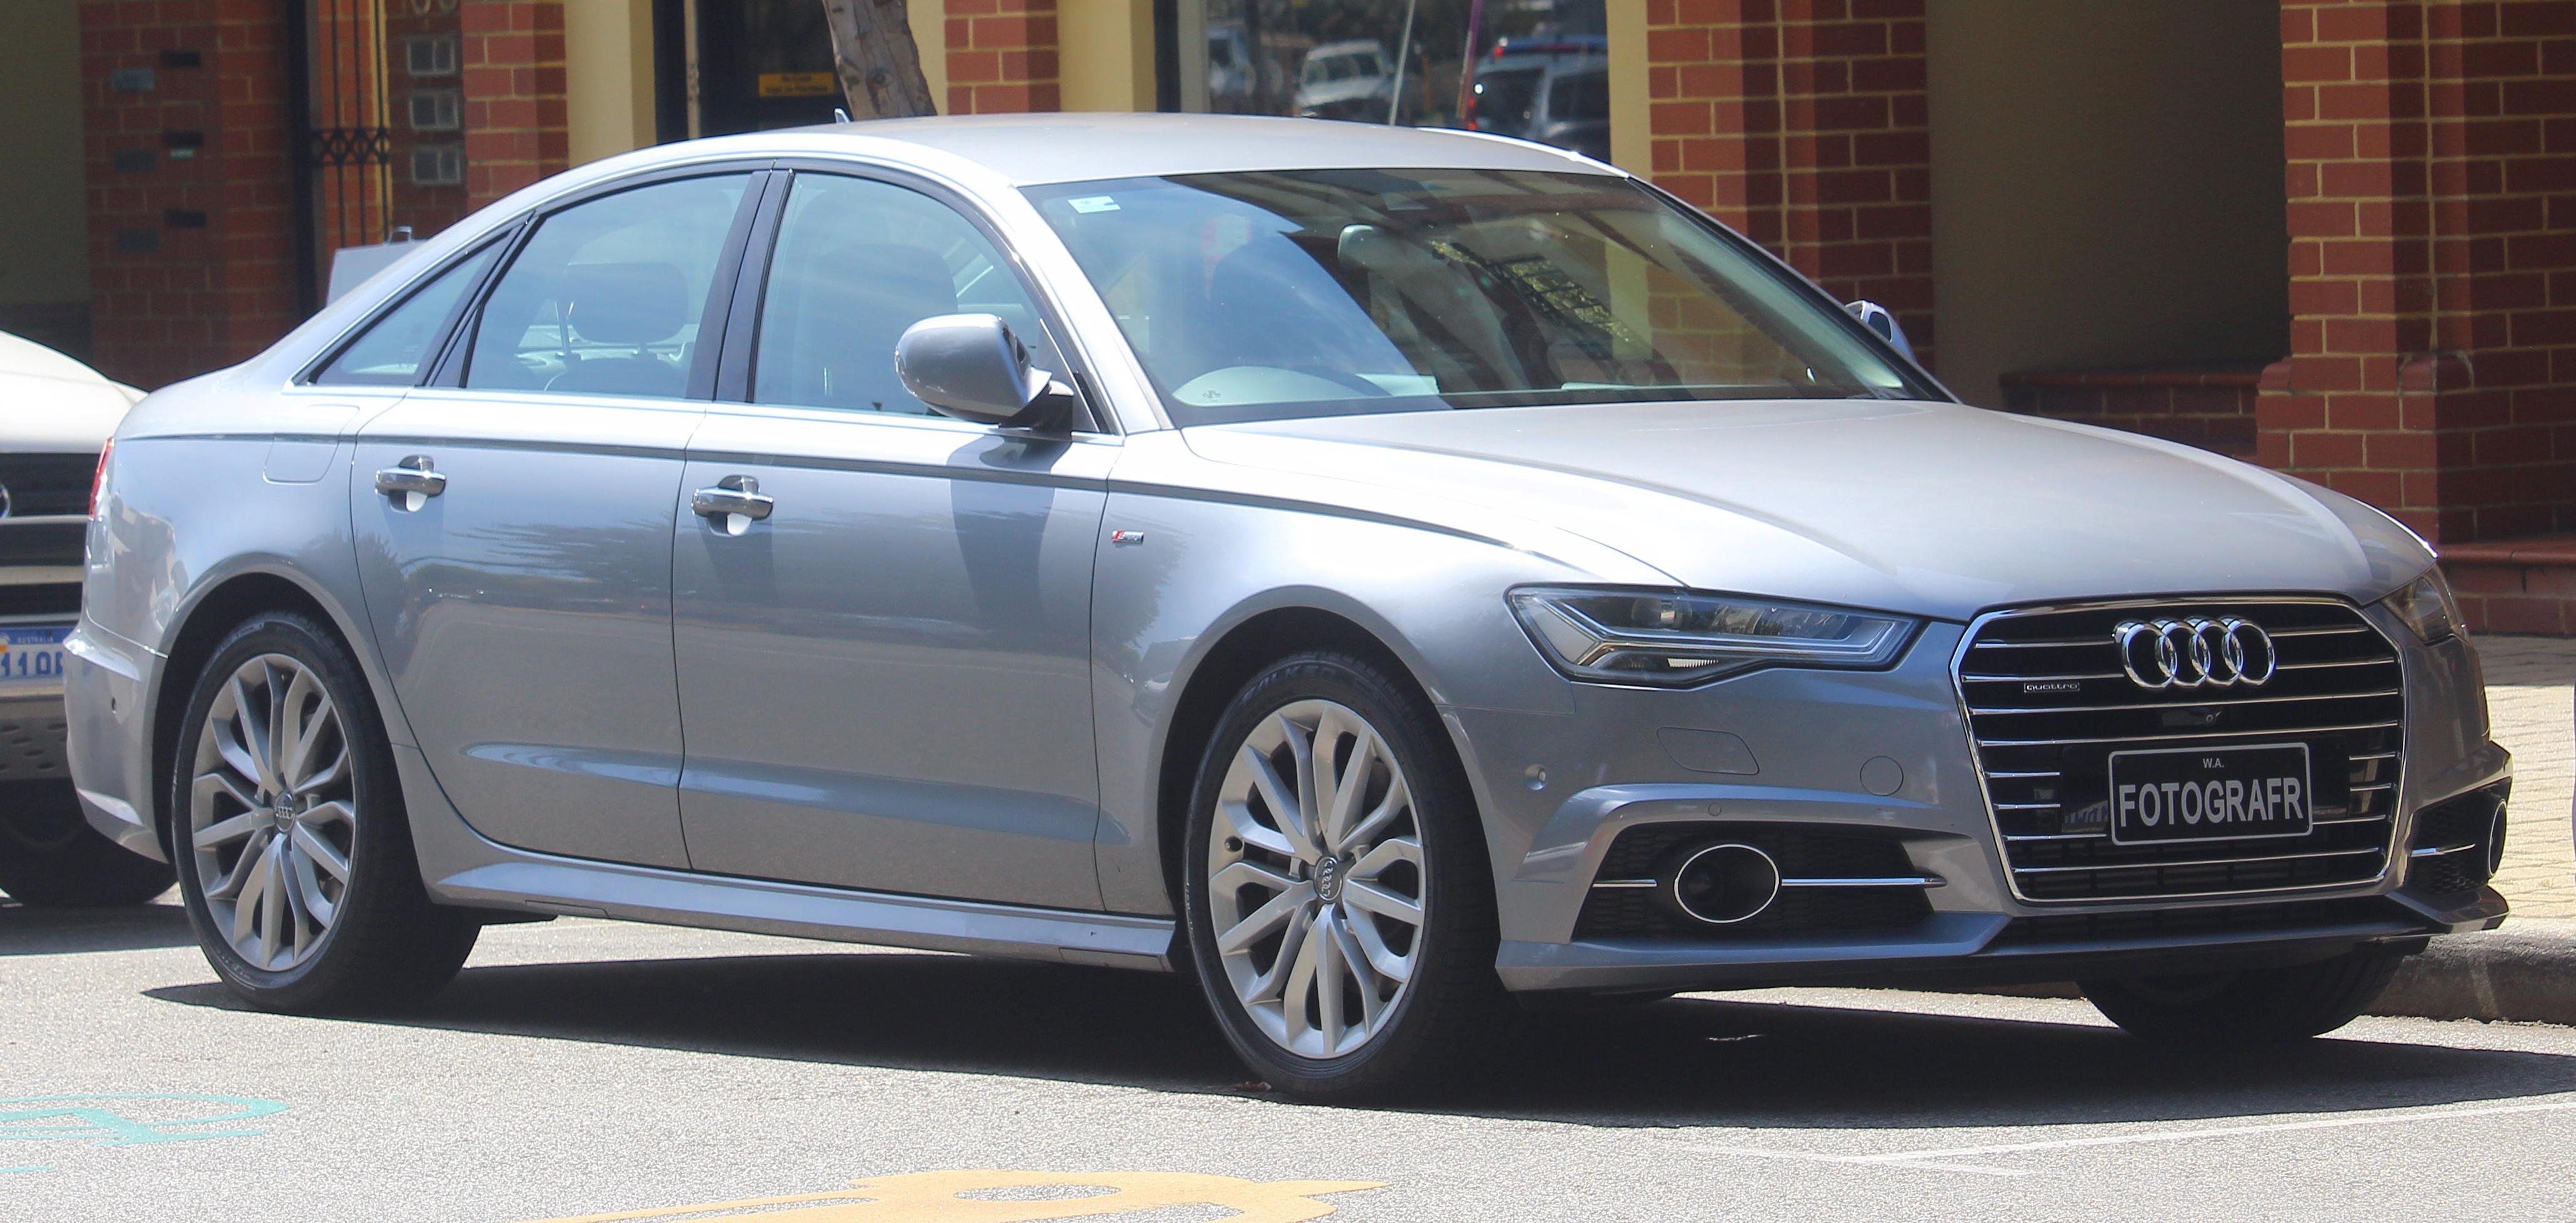 Kekurangan Audi A6 2016 Top Model Tahun Ini